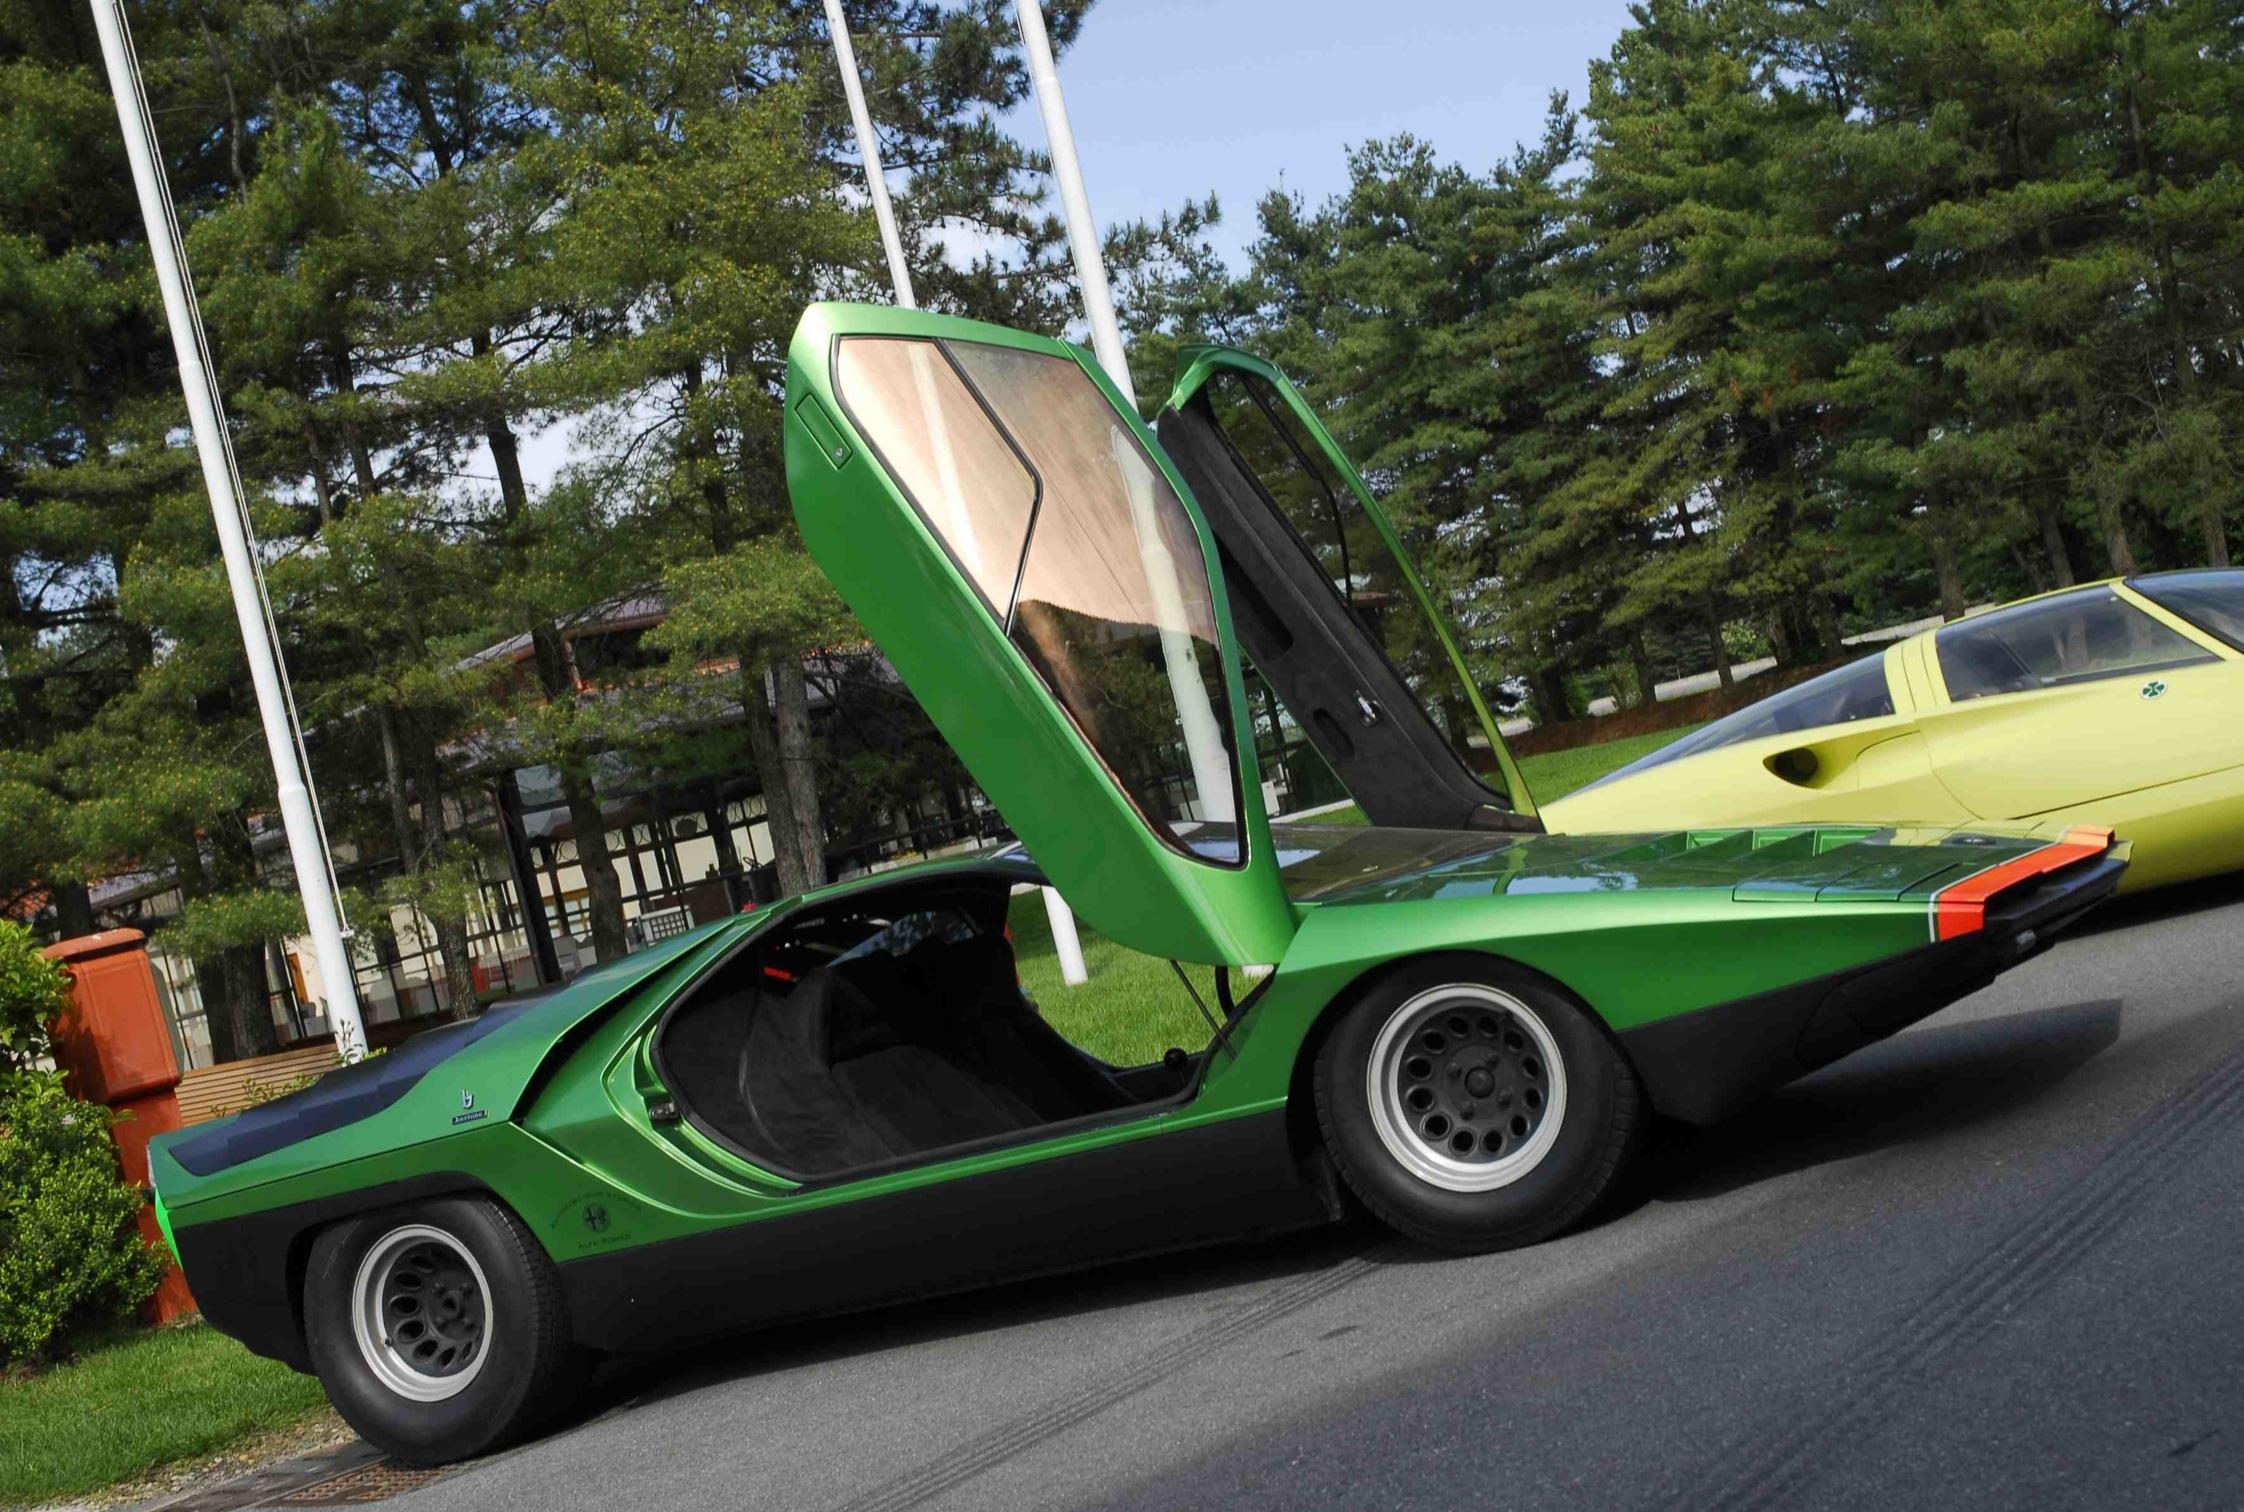 Alfa Romeo Disco Volante For Sale >> Alfa Romeo Carabo - Centenaire Alfa Romeo - diaporama ...